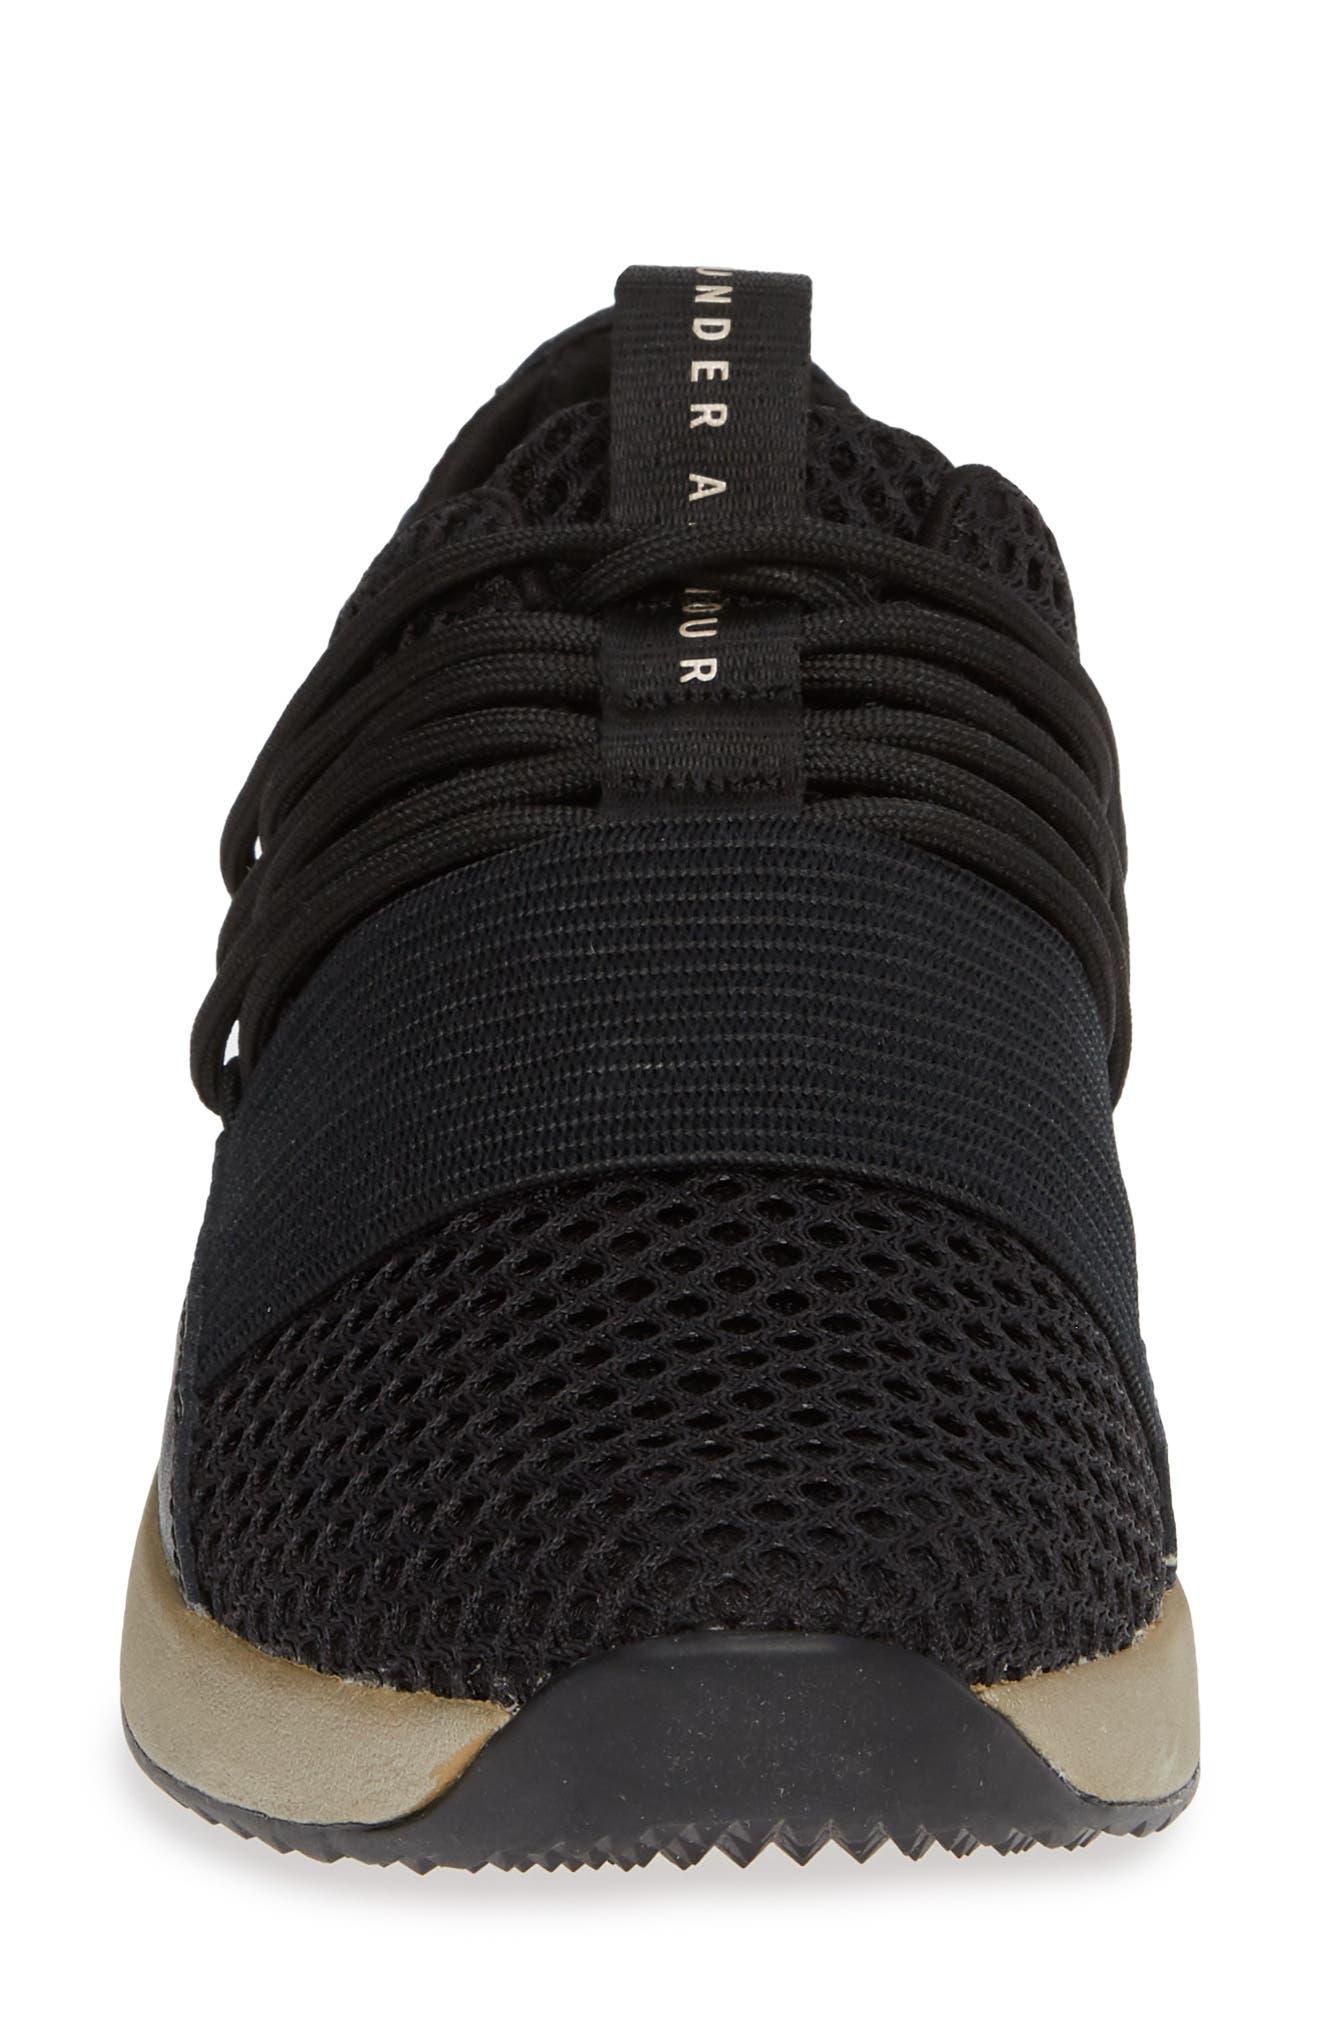 Breathe Lace X NM Sneaker,                             Alternate thumbnail 4, color,                             BLACK/ METALLIC FADED GOLD